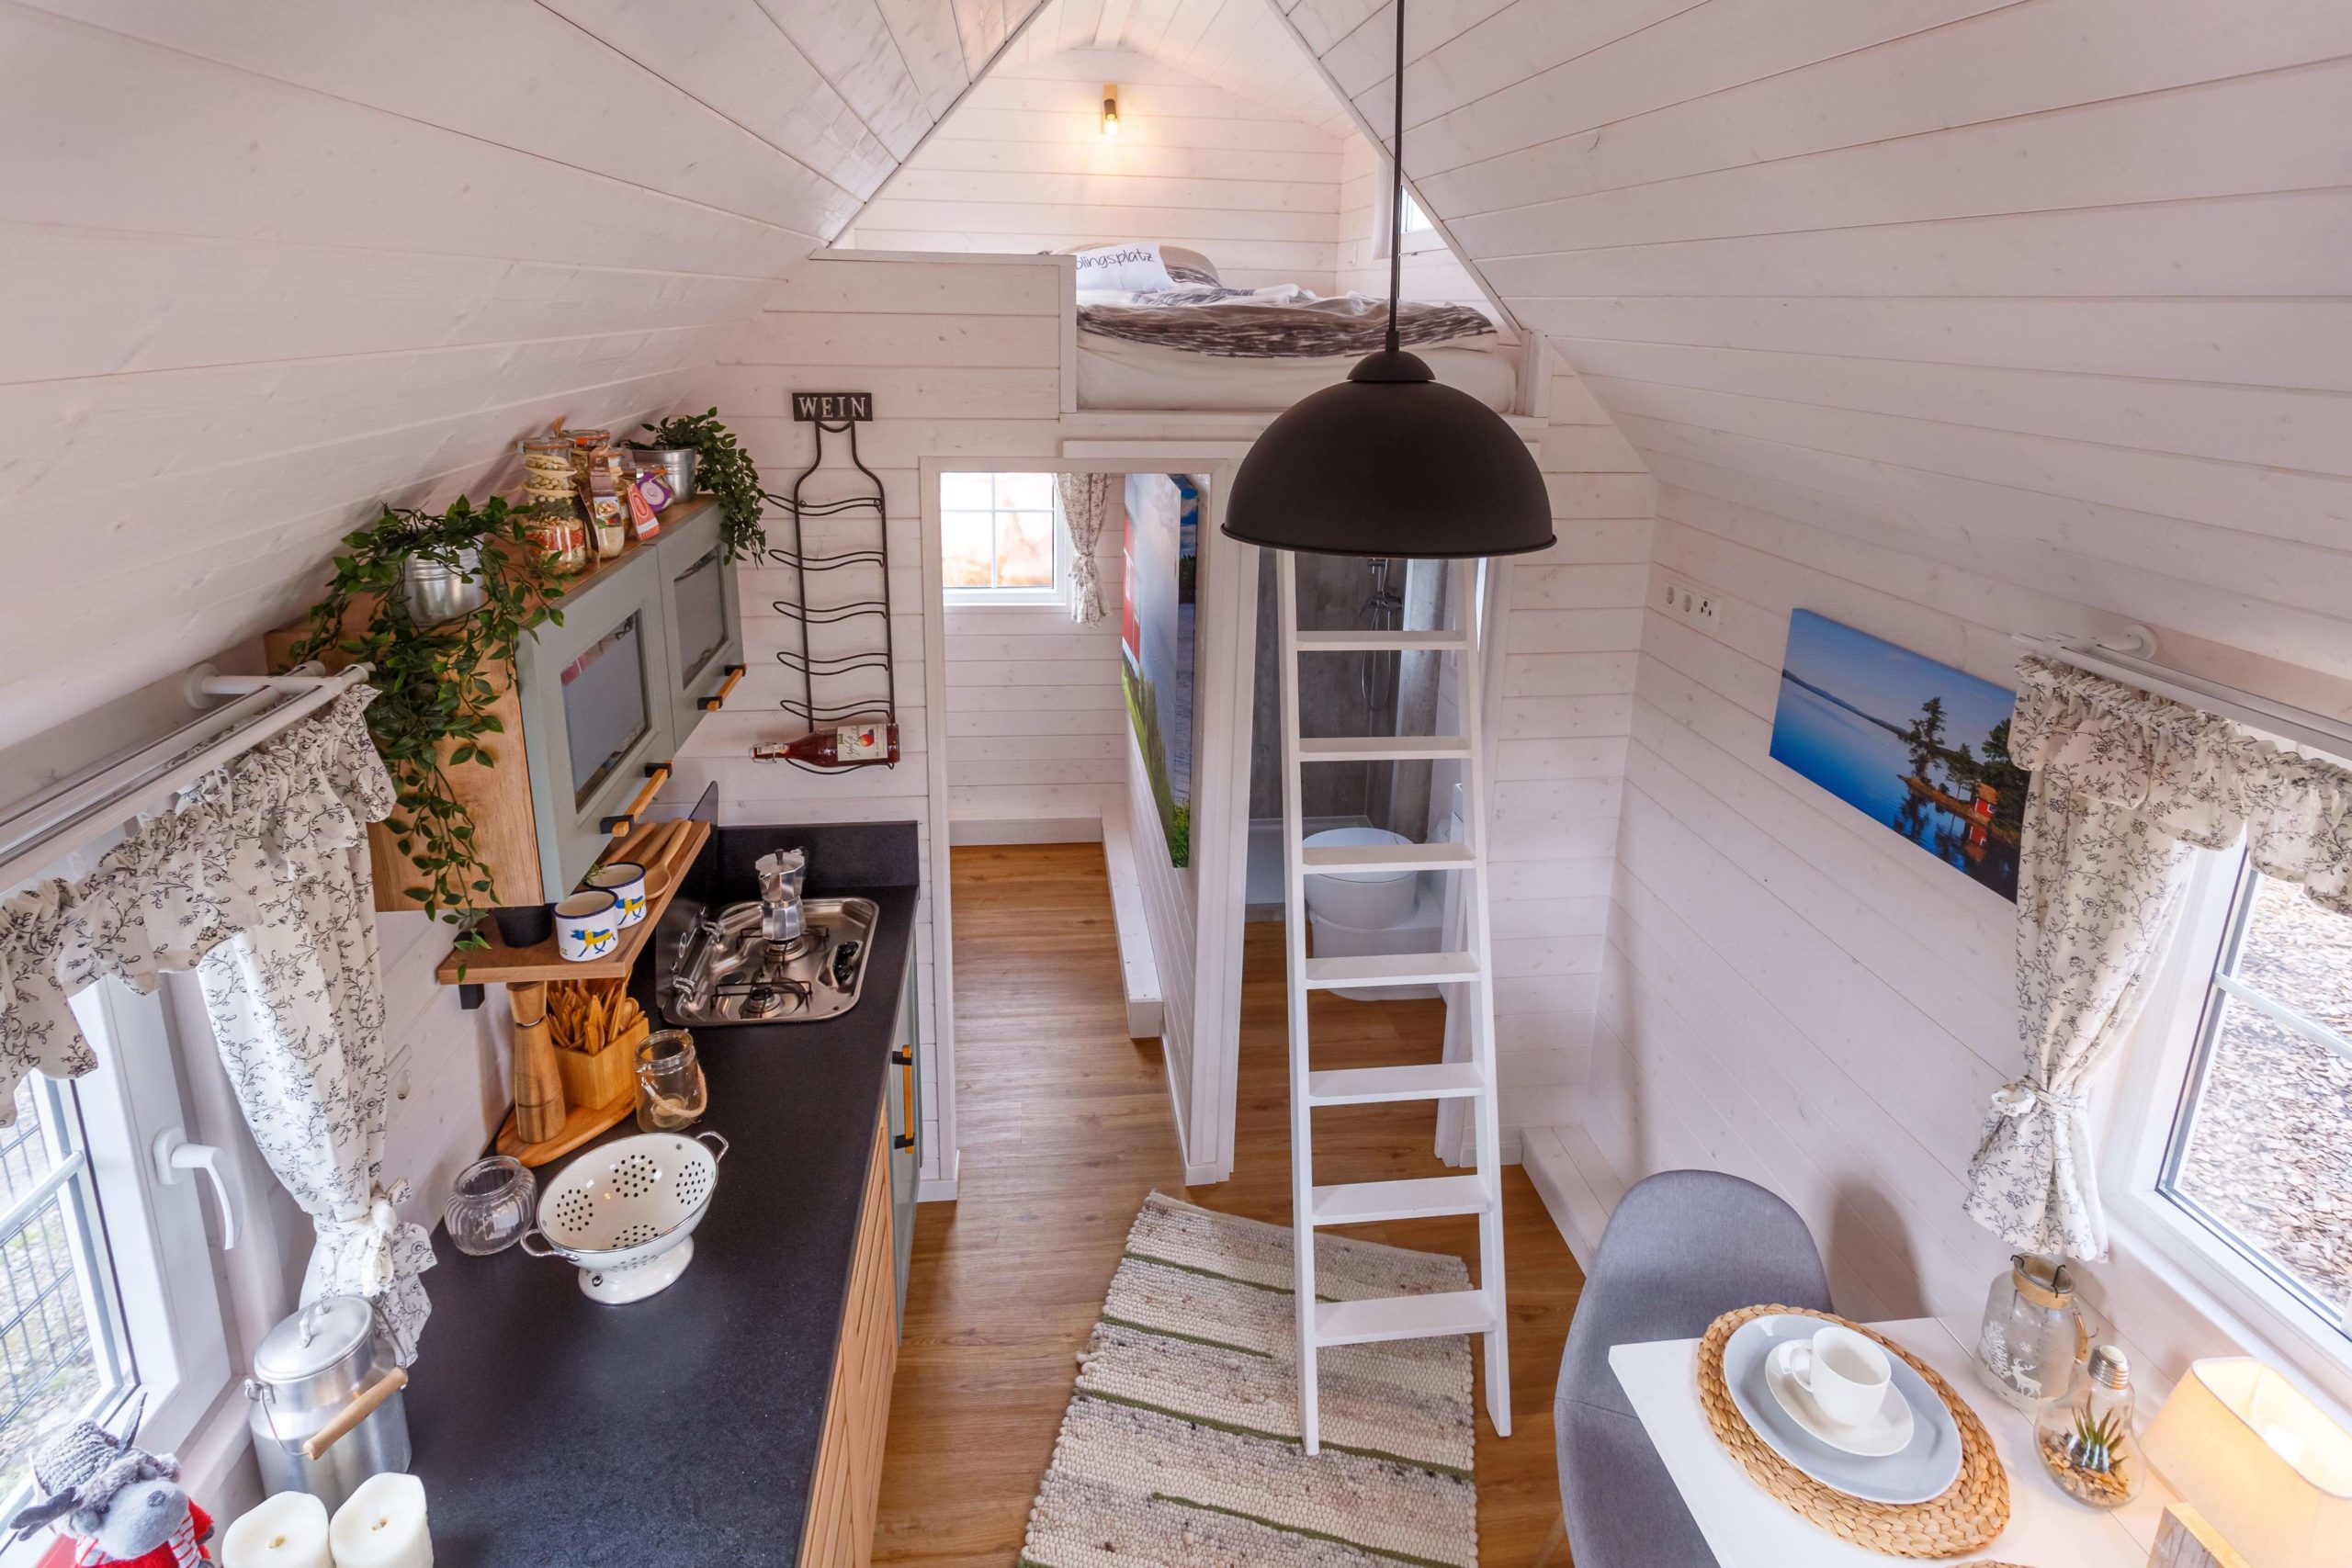 mobiles-tiny-house-schweden-vital-camp-gmbh-39